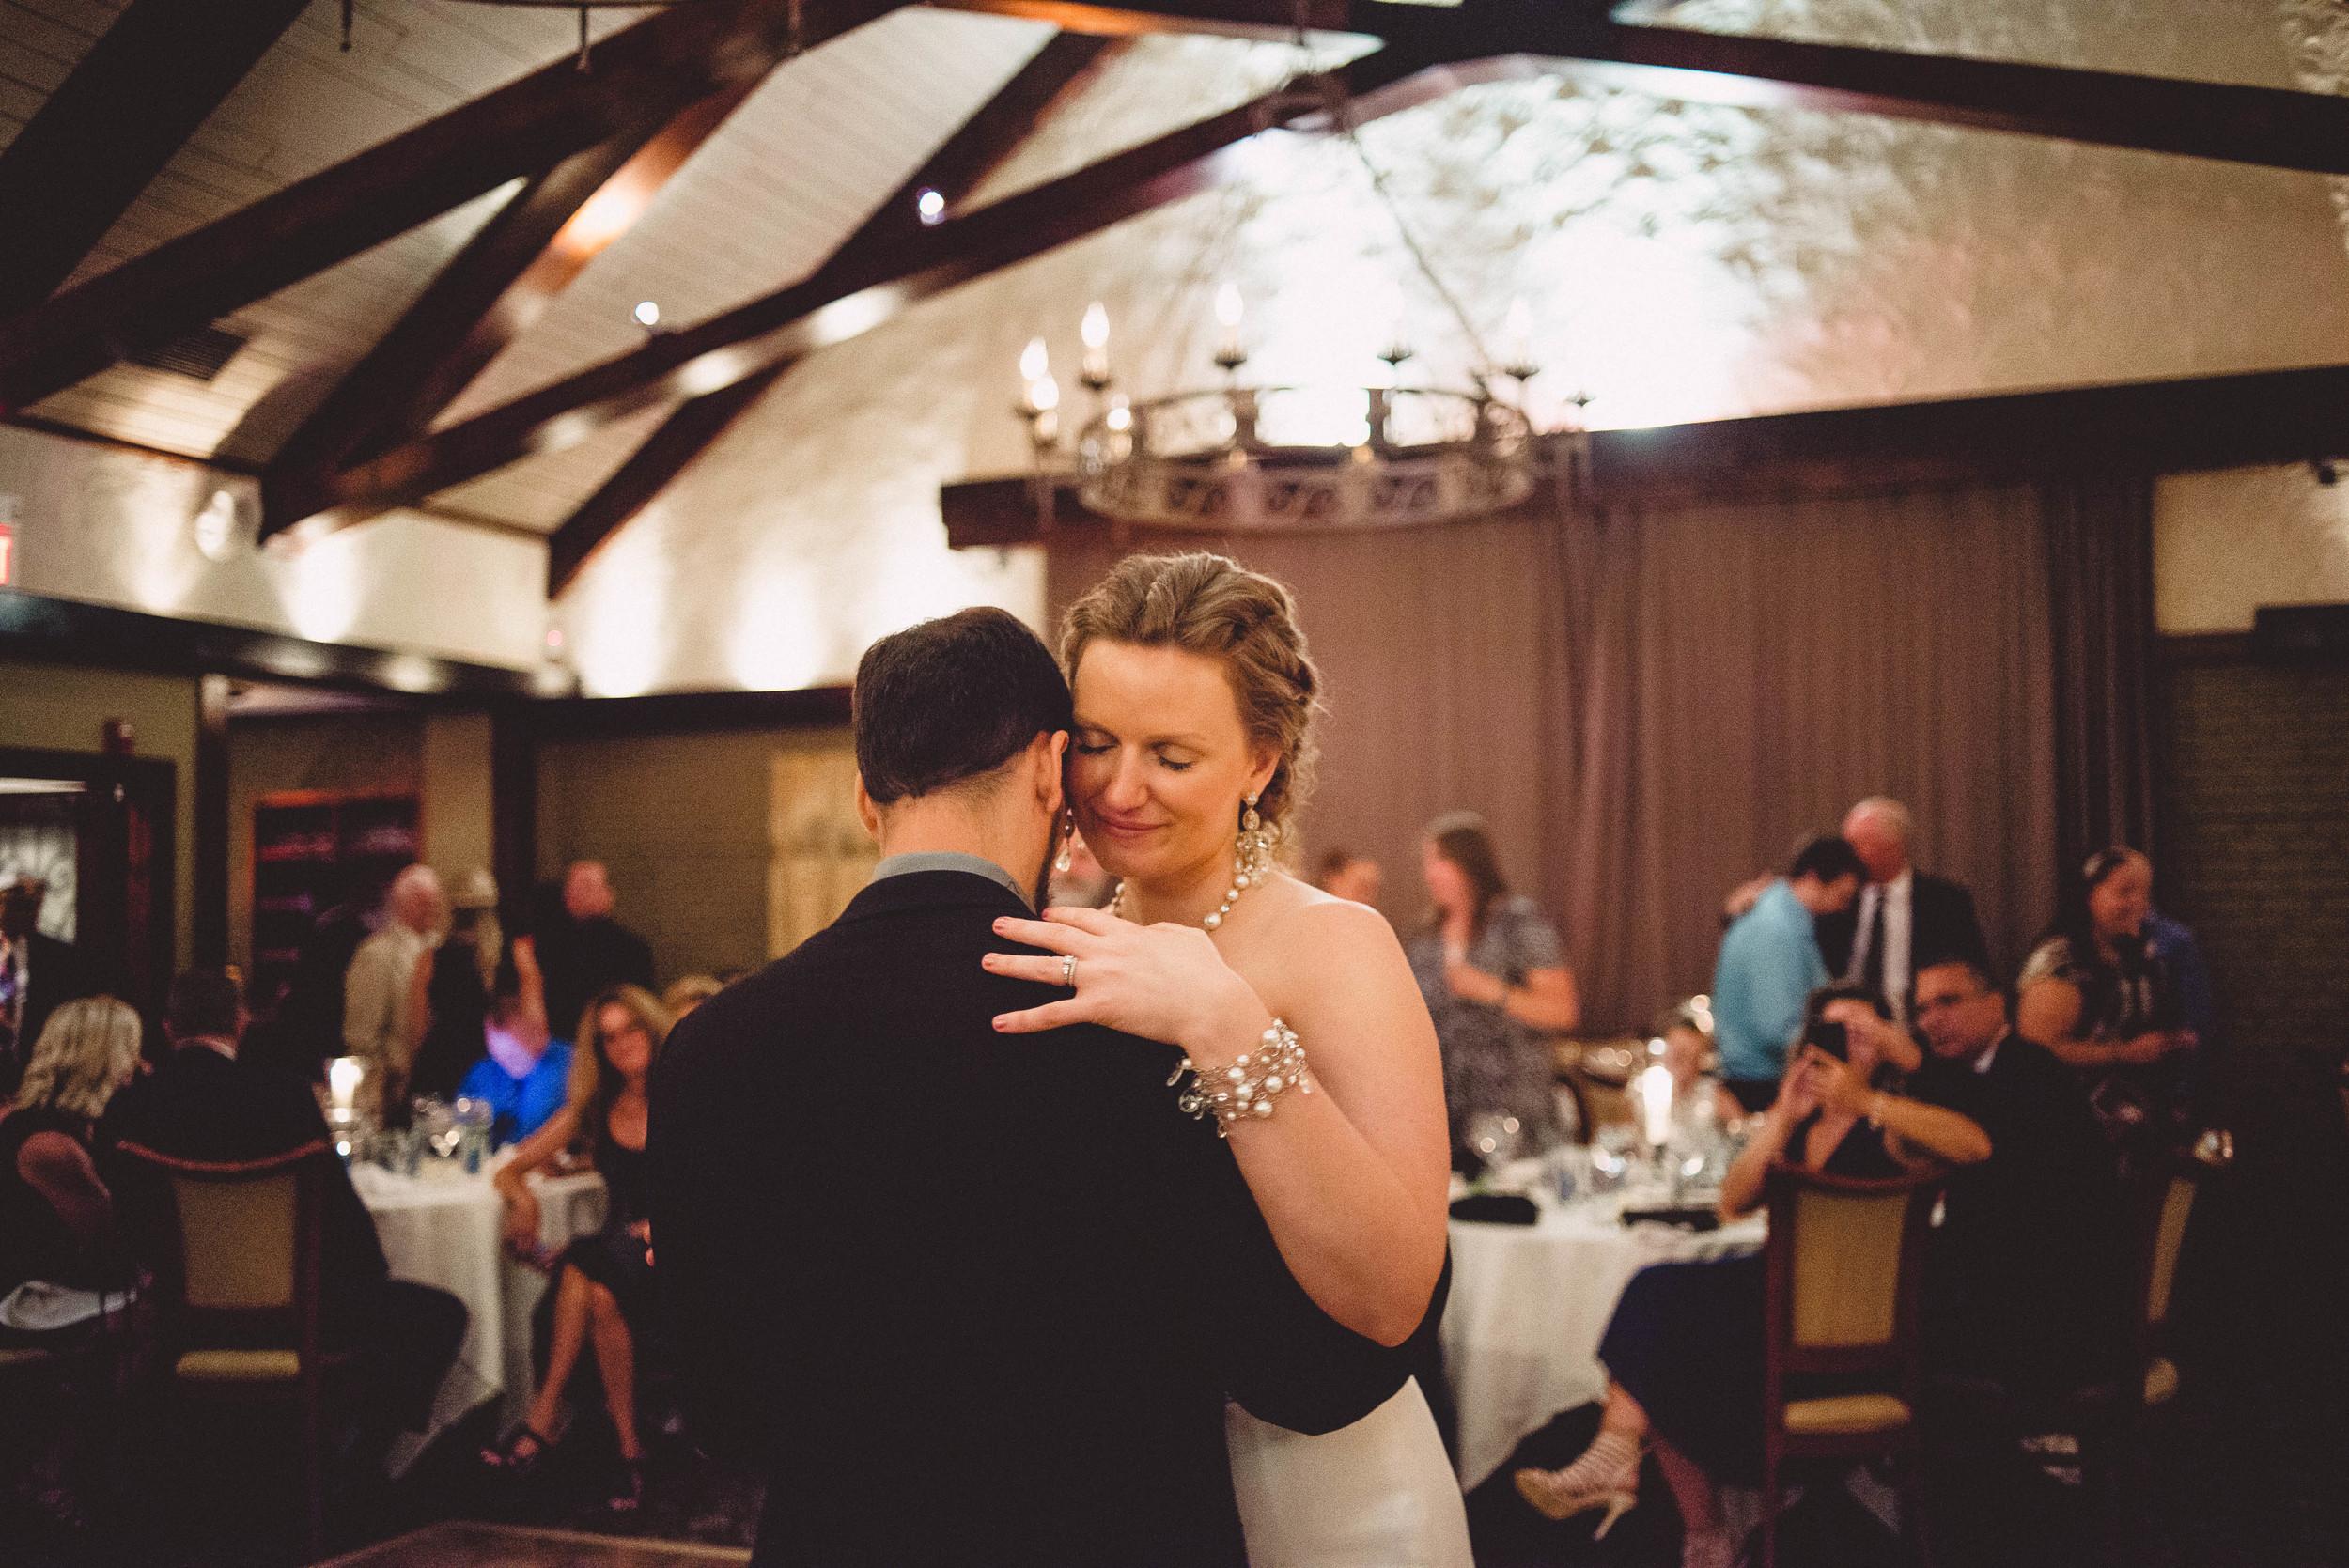 Matt and Shannon Wedding-20160730-20-58-06.JPG